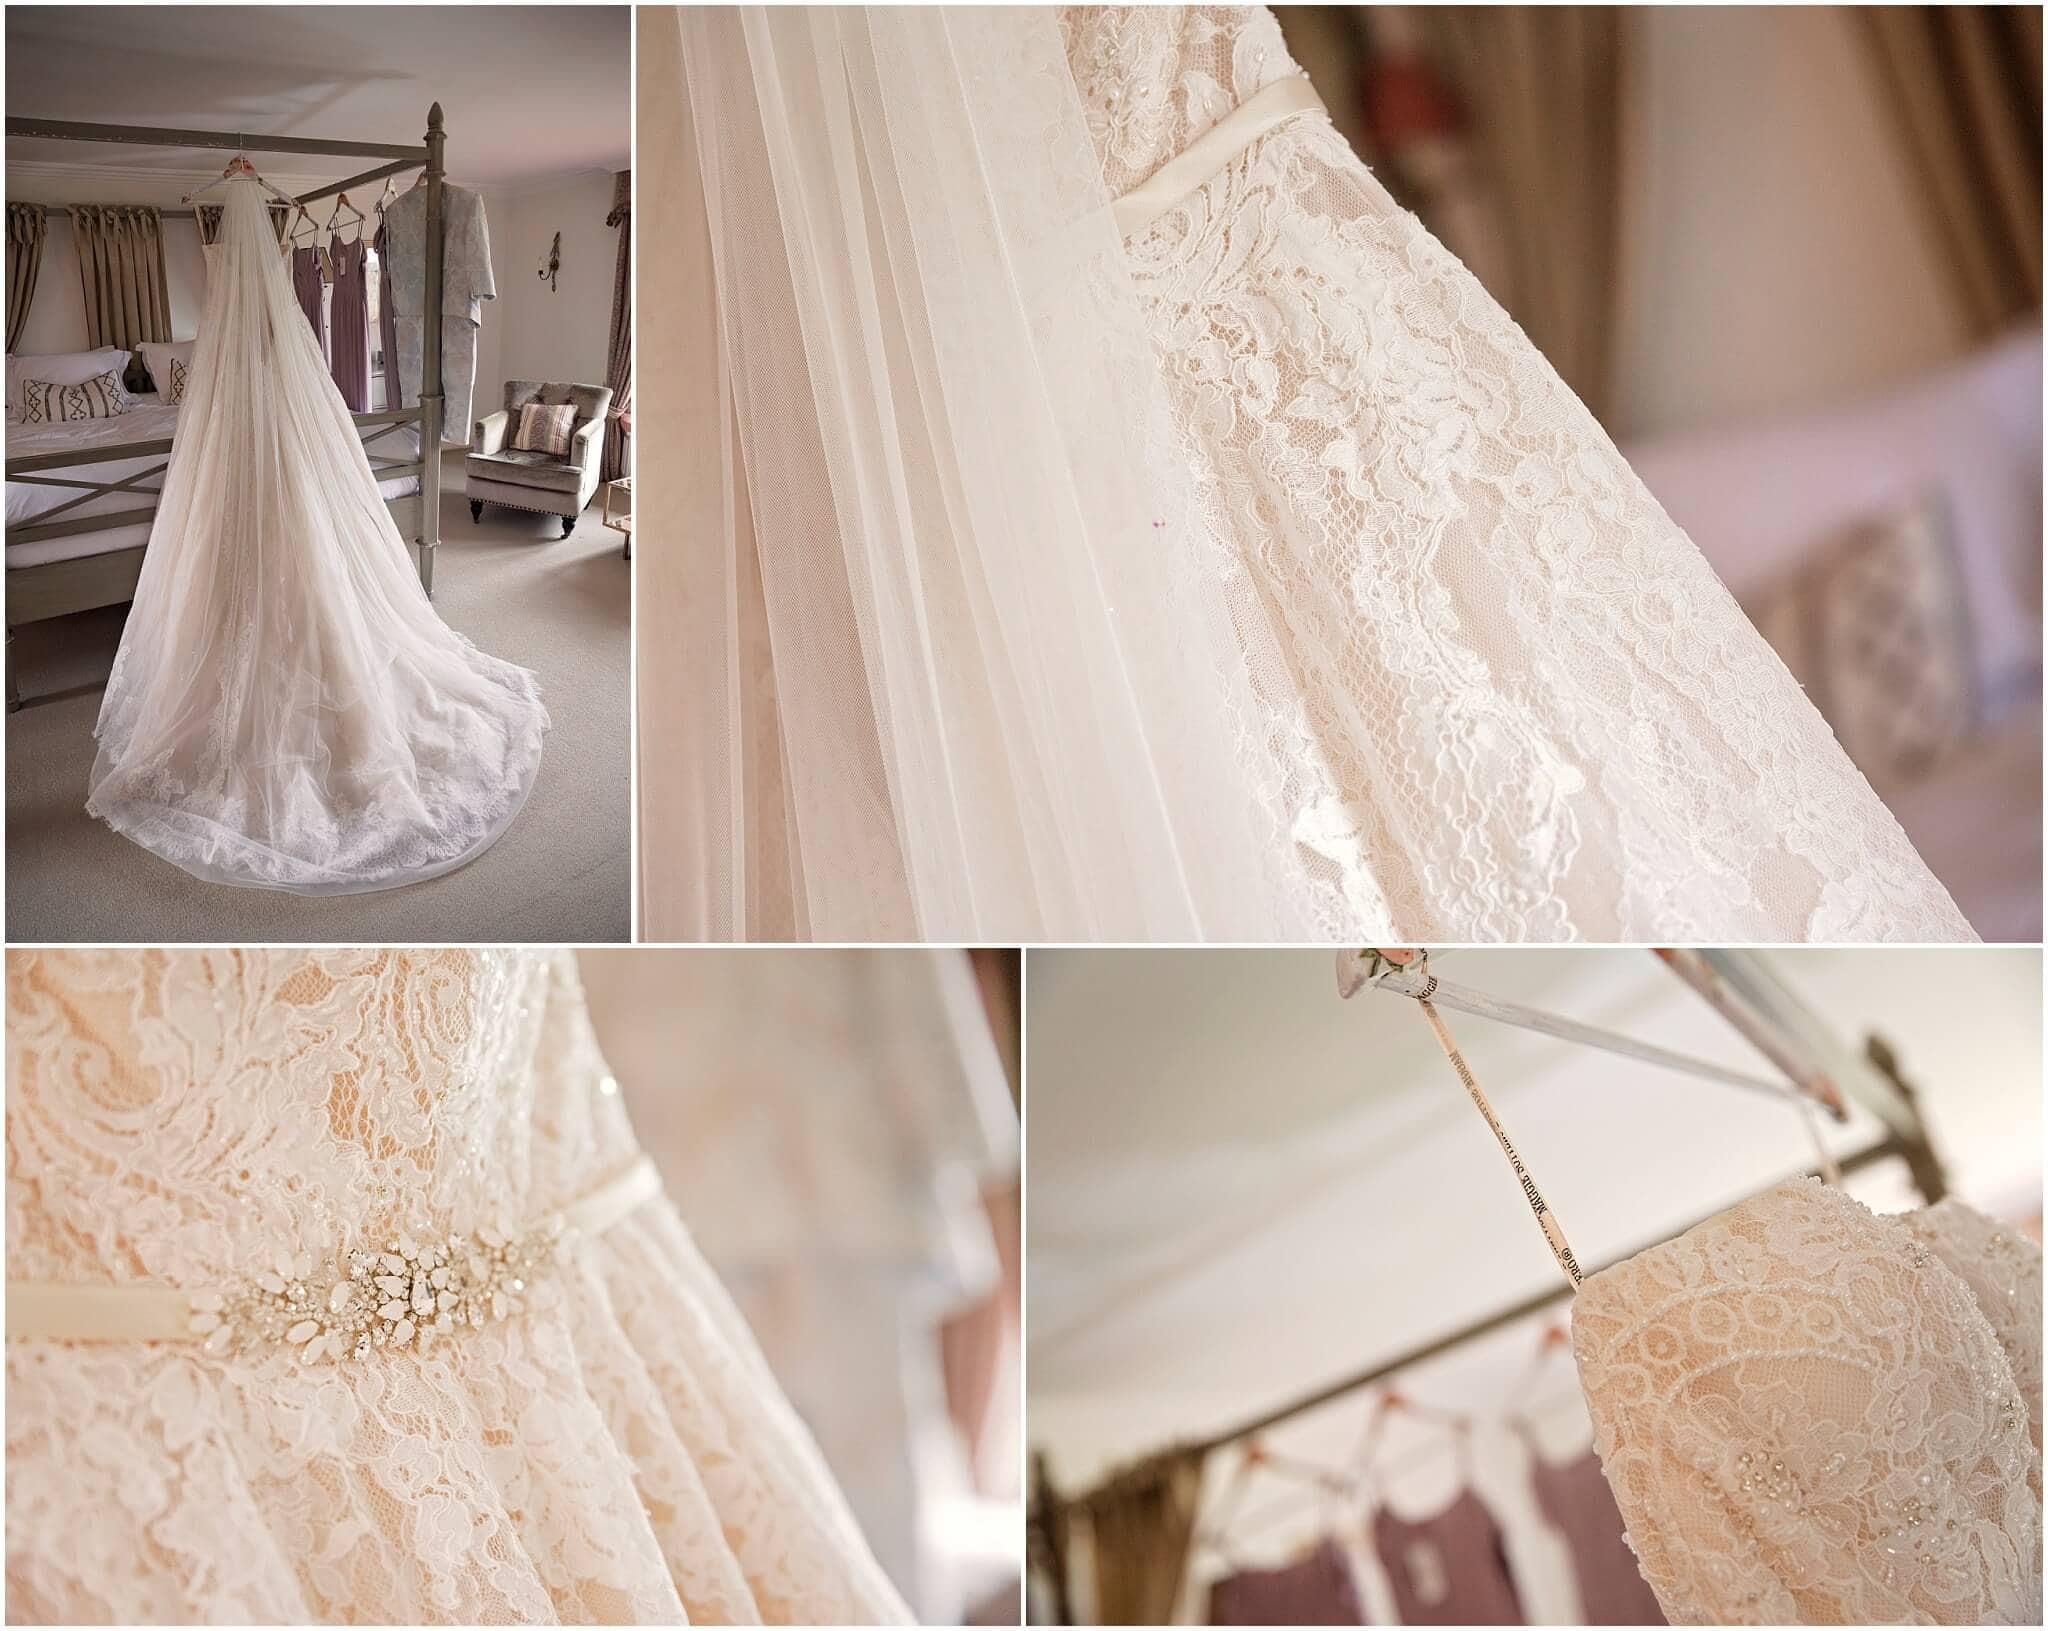 Morie Lee wedding dress